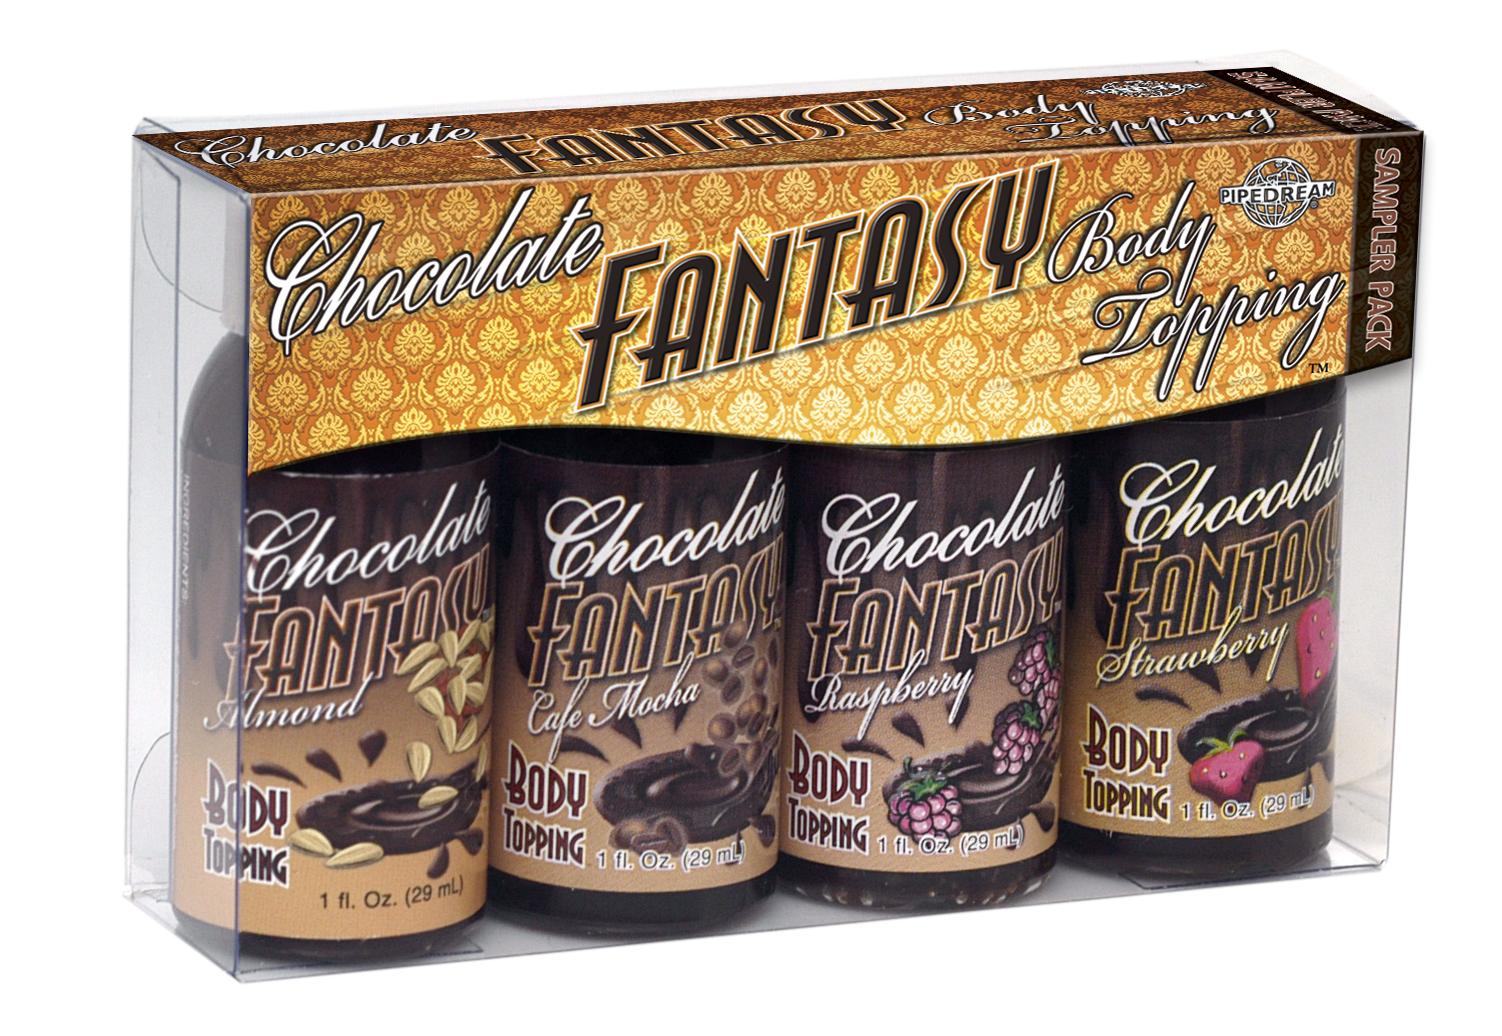 CHOCOLATE FANTASY BODY TOPPING SAMPLER 4 PACK